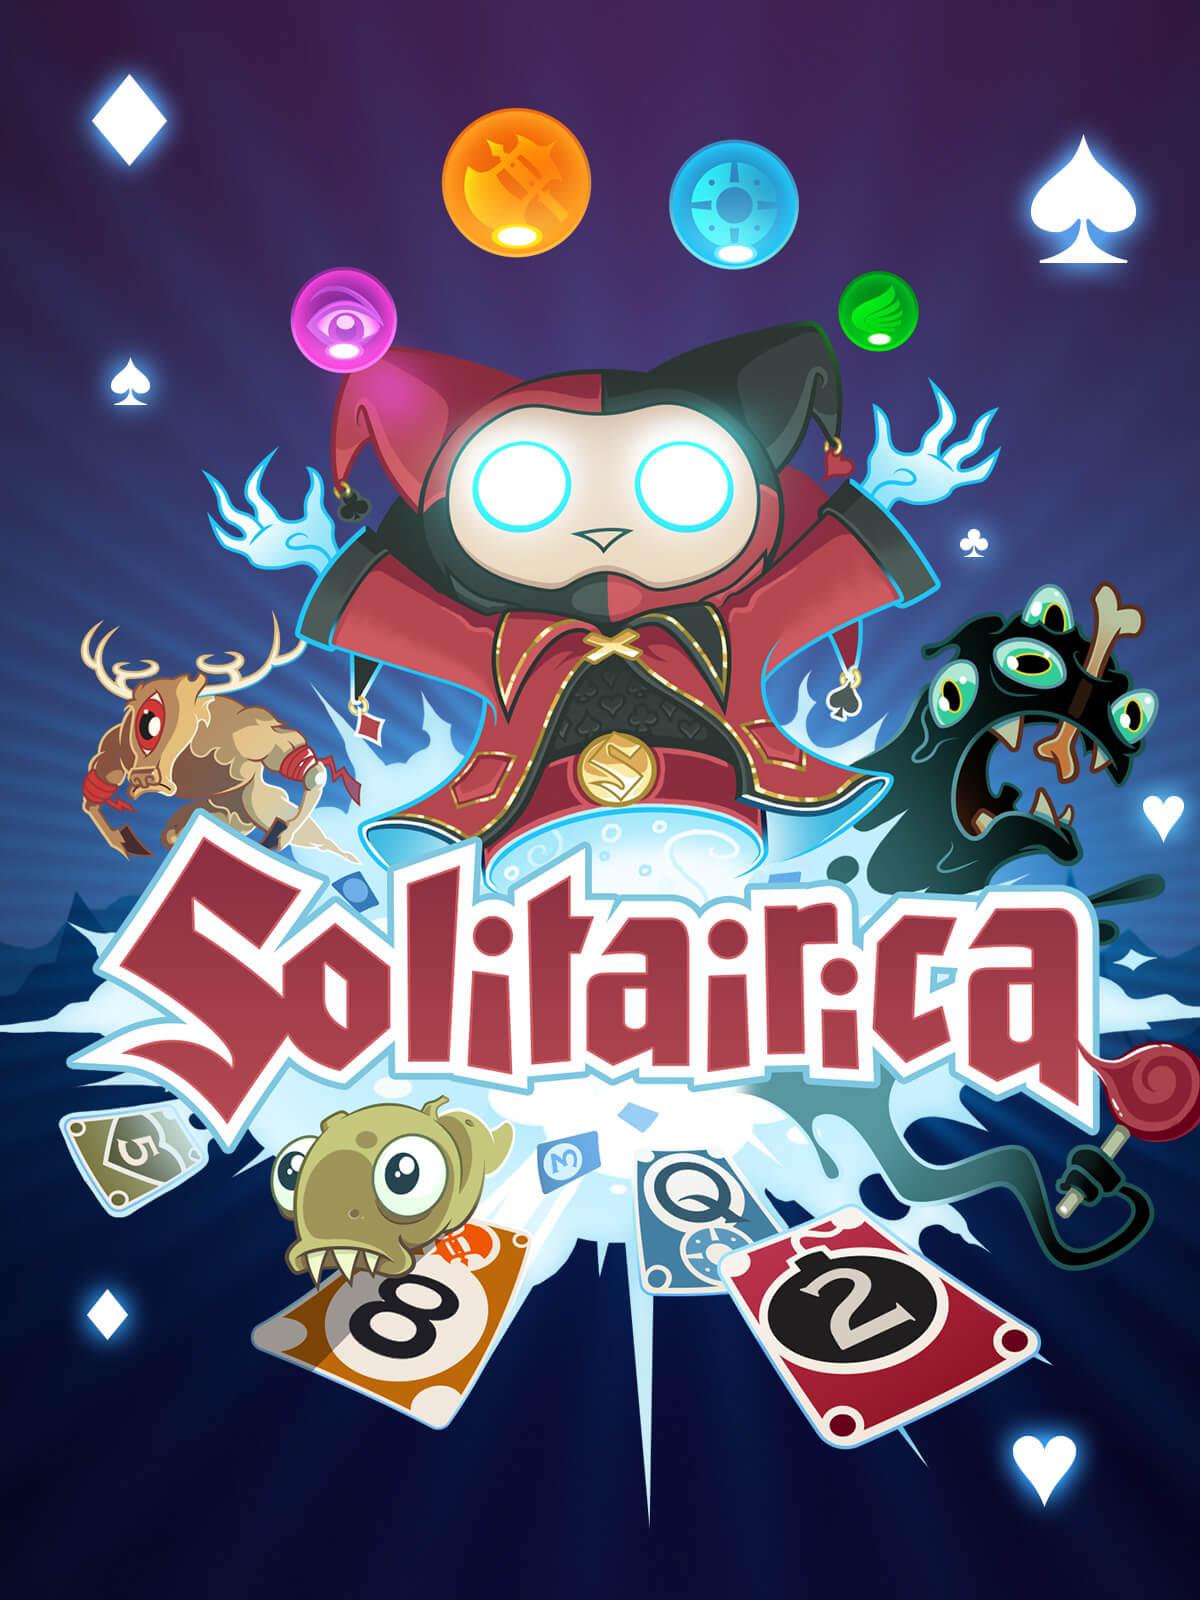 [Ya disponible] Solitairica GRATIS en Epic Games 29/12